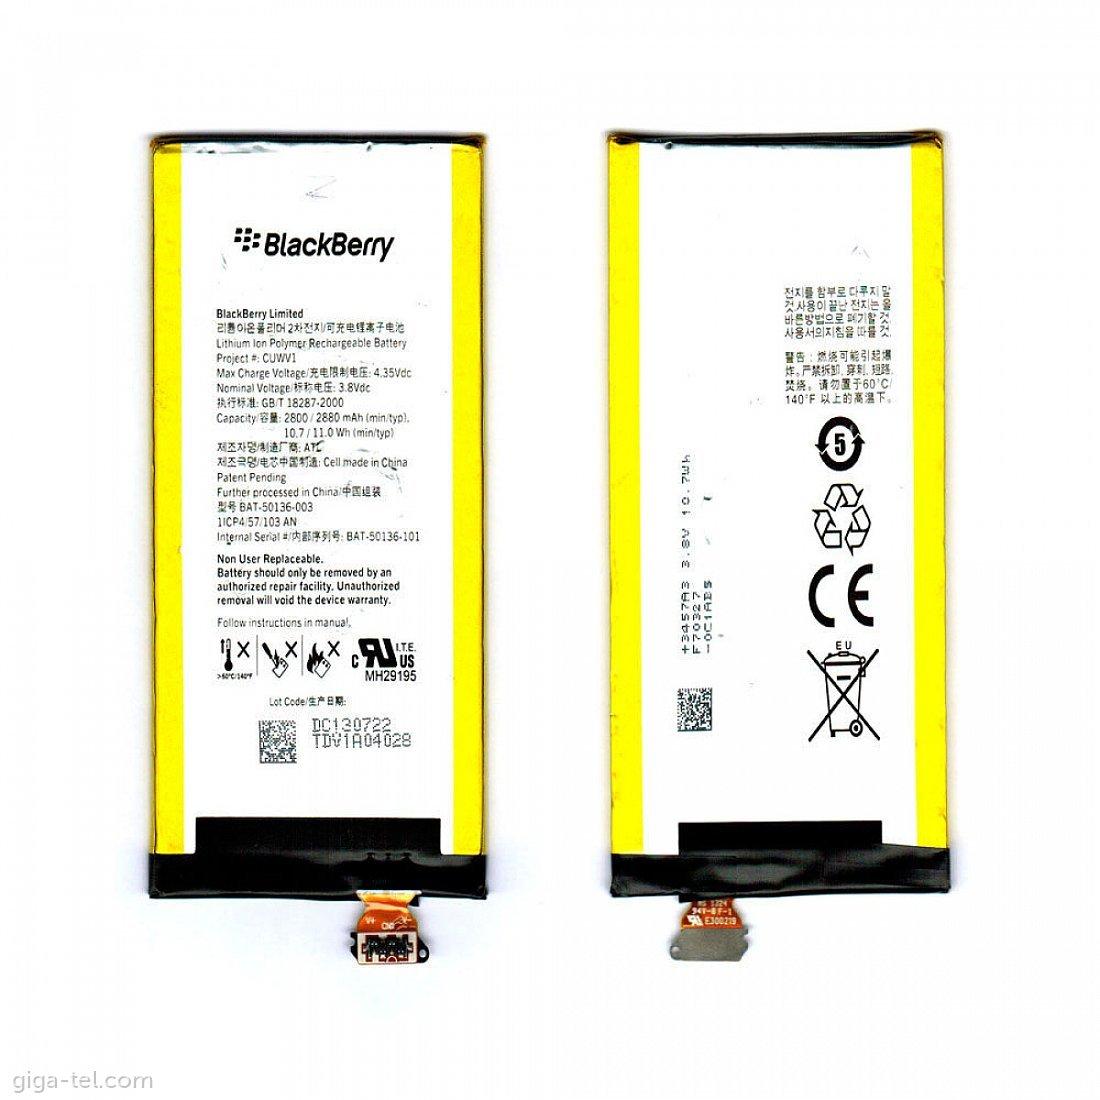 Blackberry Z30 battery - CUWV1 / BAT-50136-003